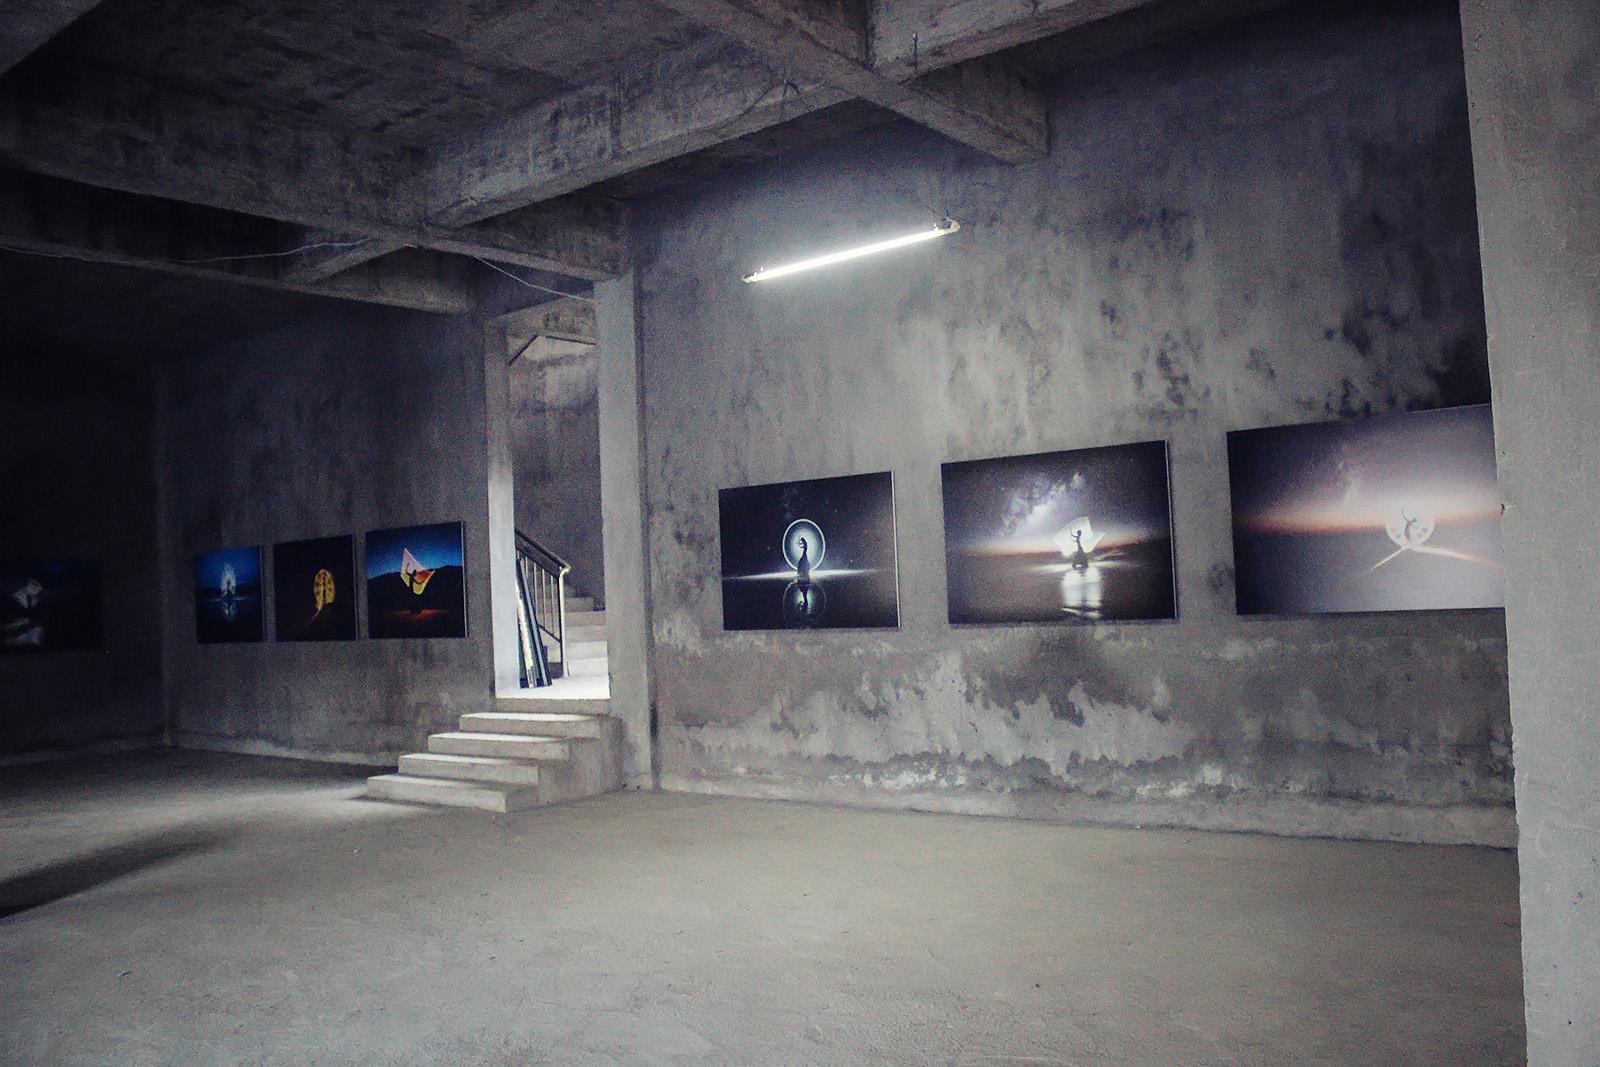 light-painting-exhibition-china-eric-pare-kim-henry-huangshan-international-photography-festival-11th-yixian-6-jpg-3nxp.jpg